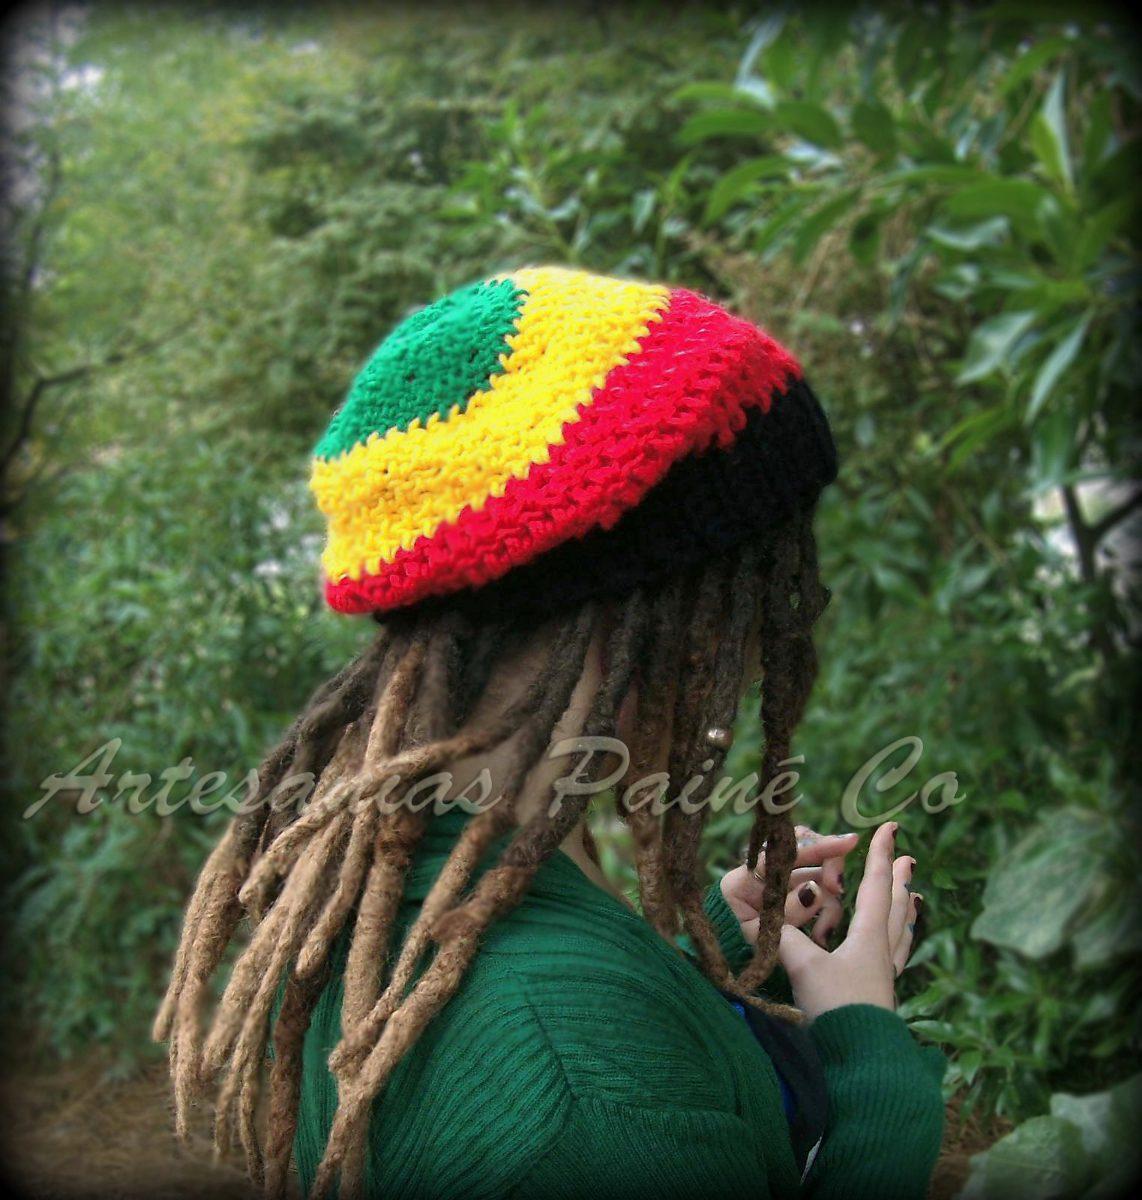 df3f4b03c931a Gorro Rastafari Tejido A Crochet. Artesanal!! -   300